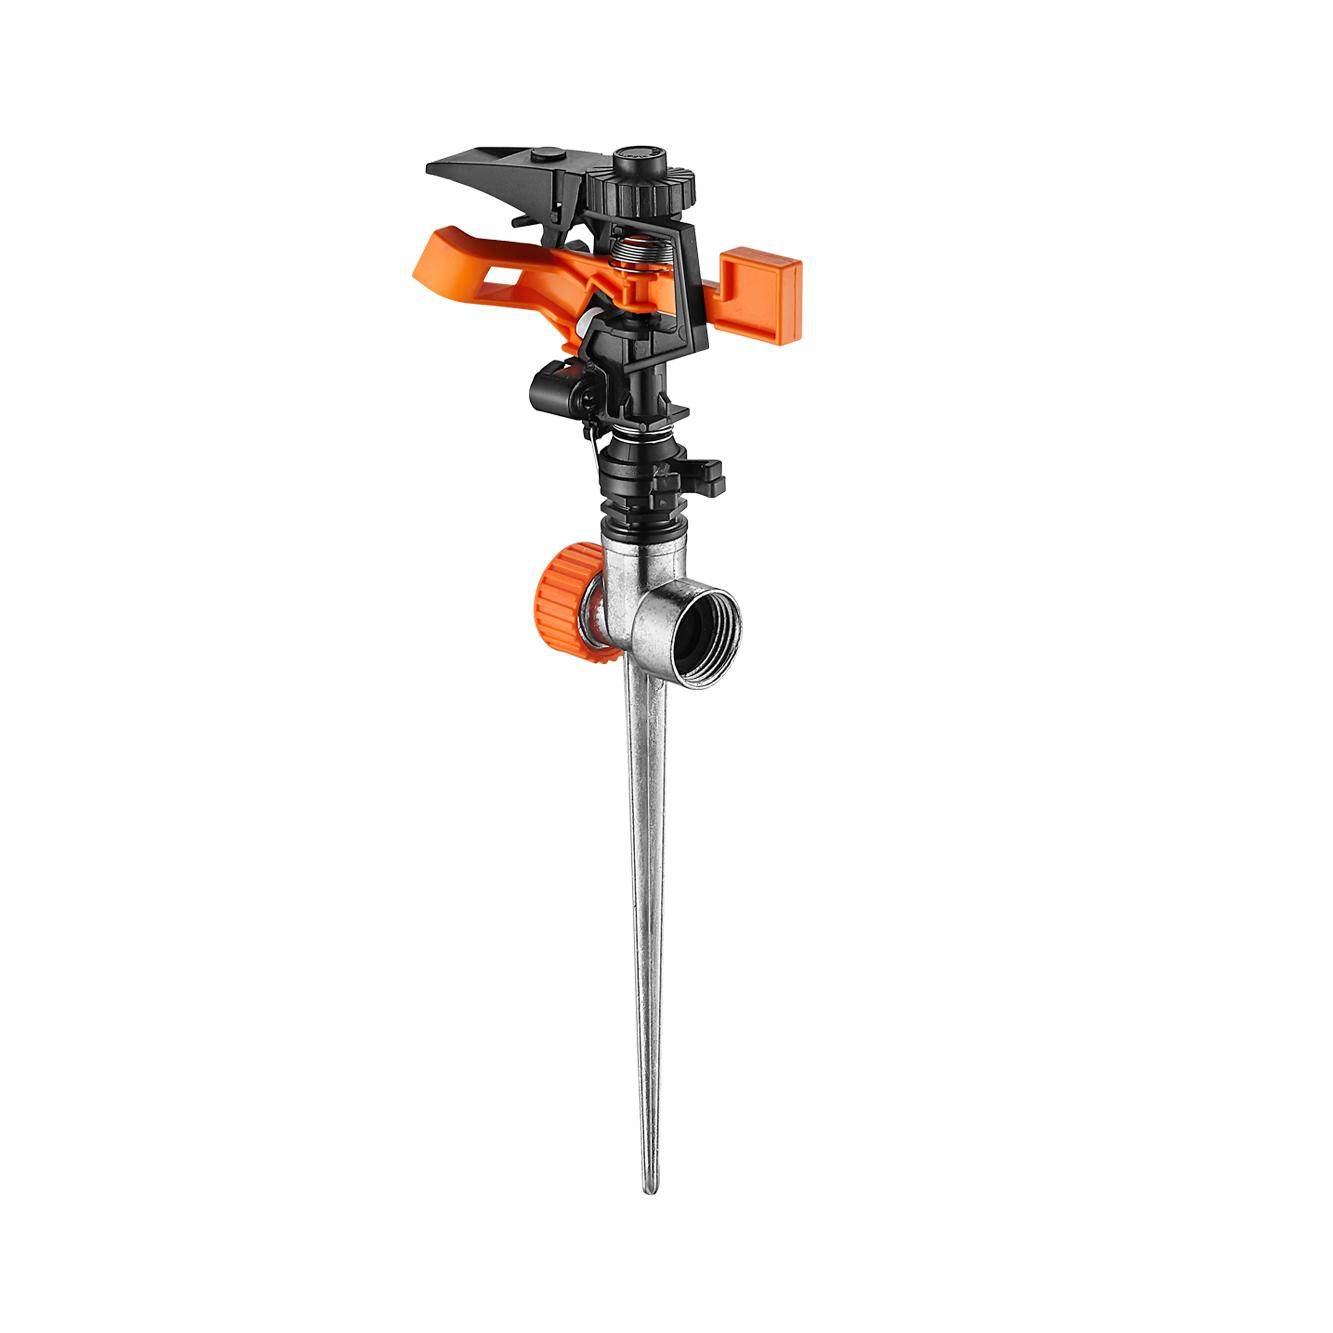 Plastic/Metal Adjustable Irrigation Rotating Water Impulse Sprinkler